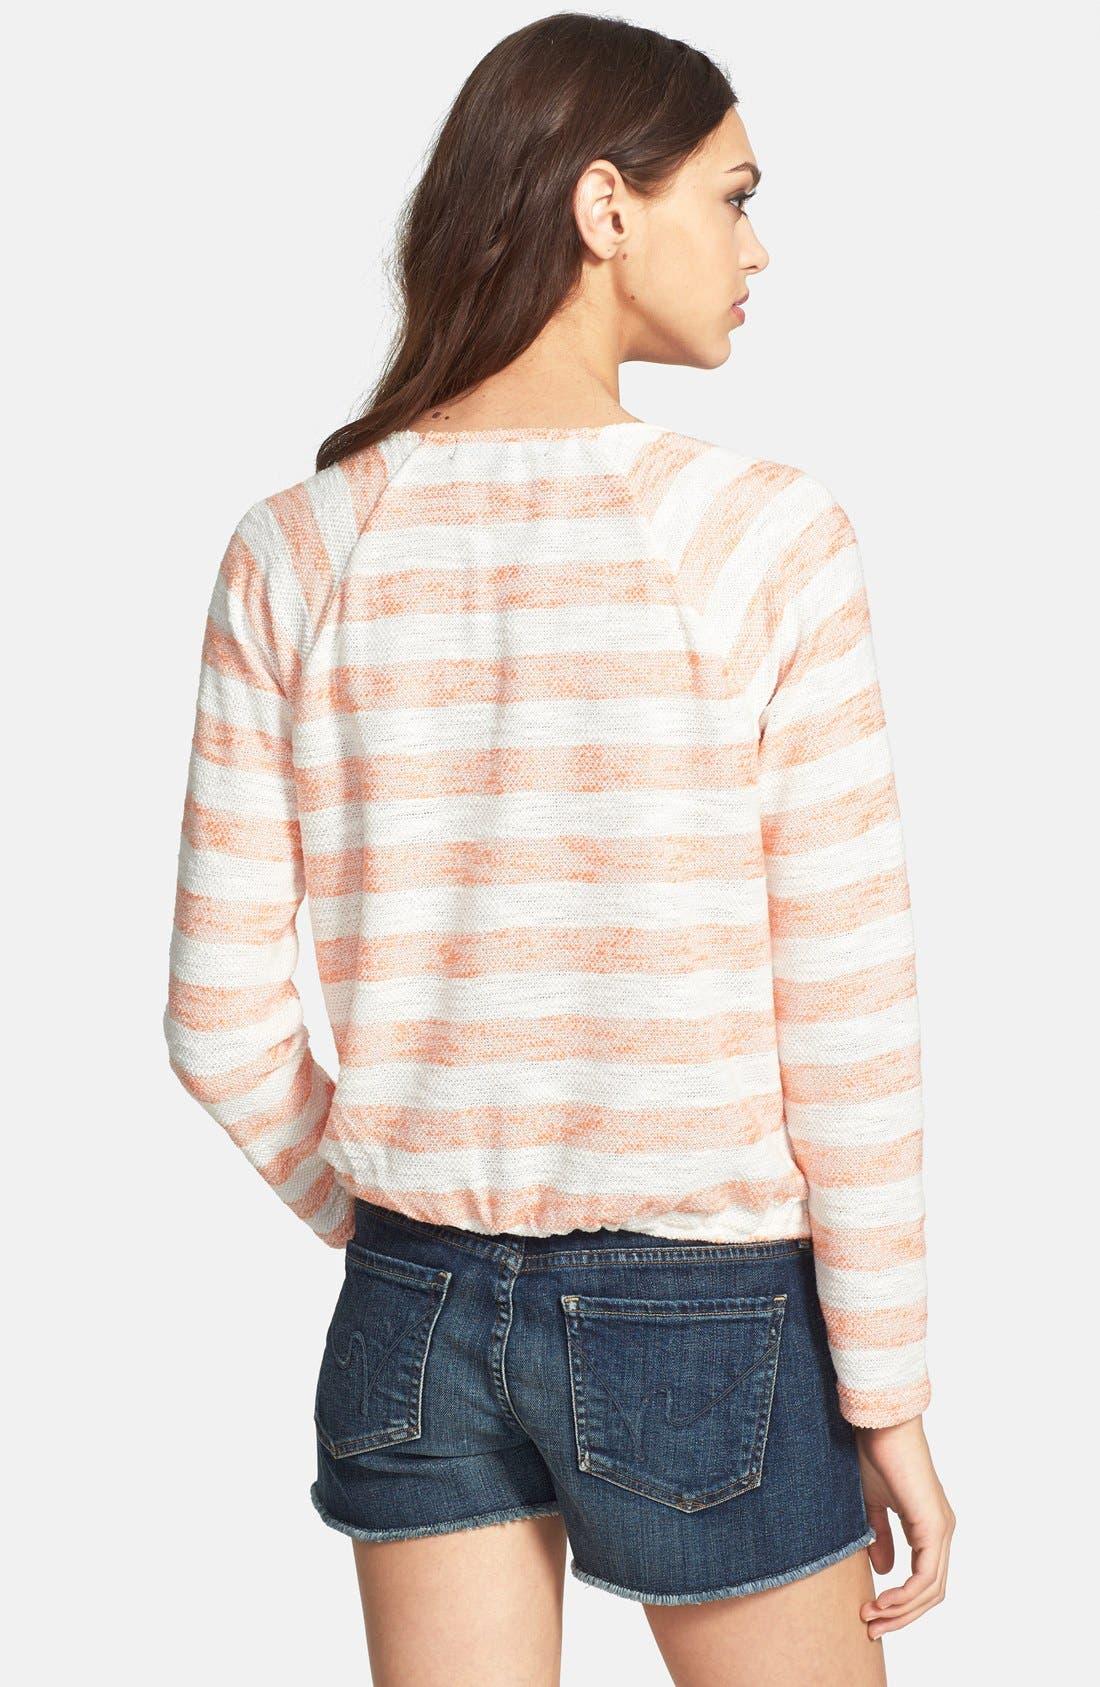 SANCTUARY, 'Beach' V-Neck Knit Sweater, Alternate thumbnail 3, color, 832